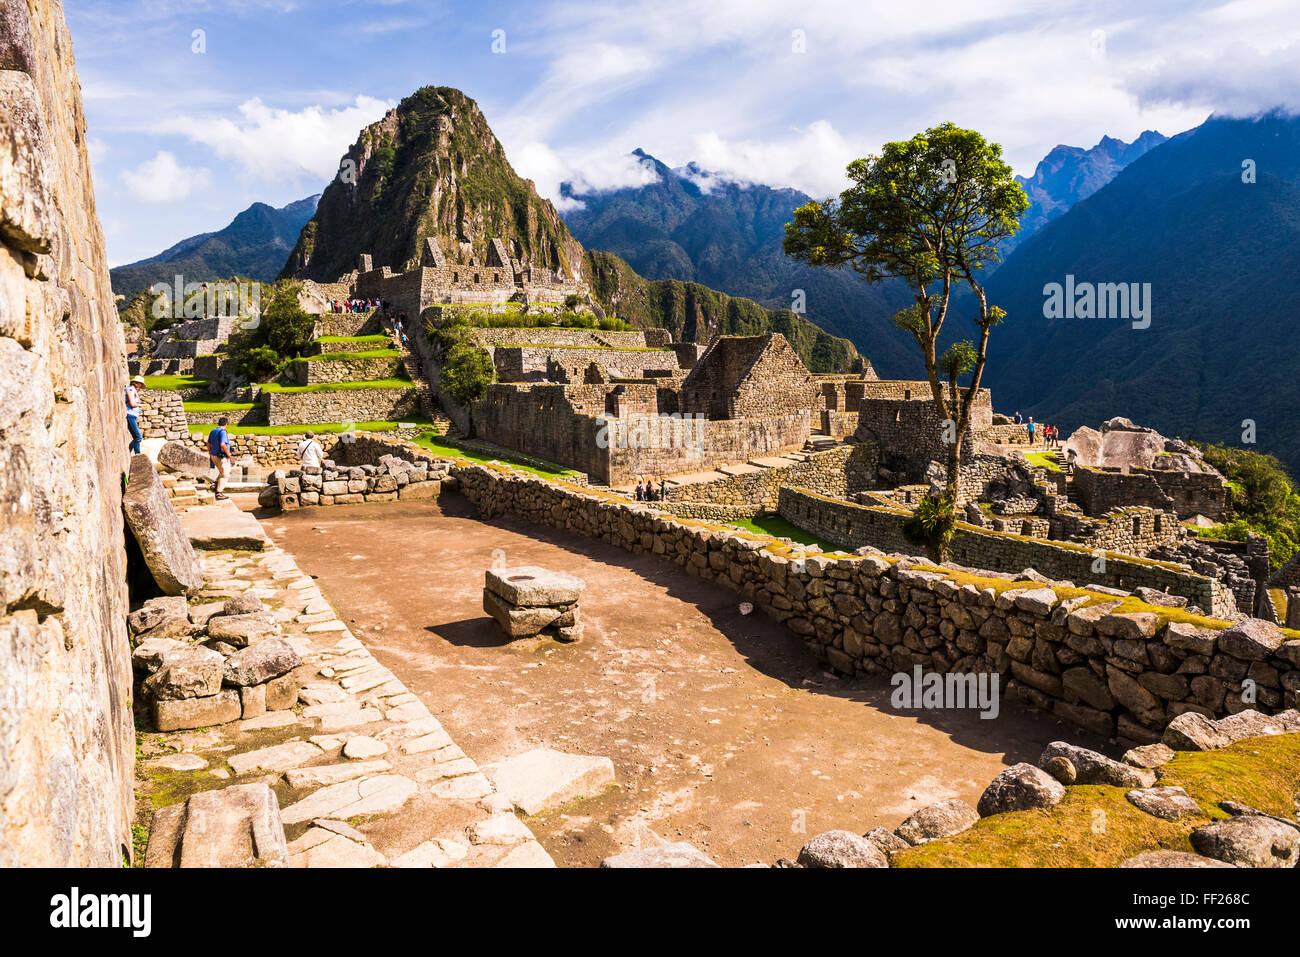 Machu Picchu Inca ruins and Huayna Picchu (Wayna Picchu), UNESCO WorRMd Heritage Site, Cusco Region, Peru, South - Stock Image